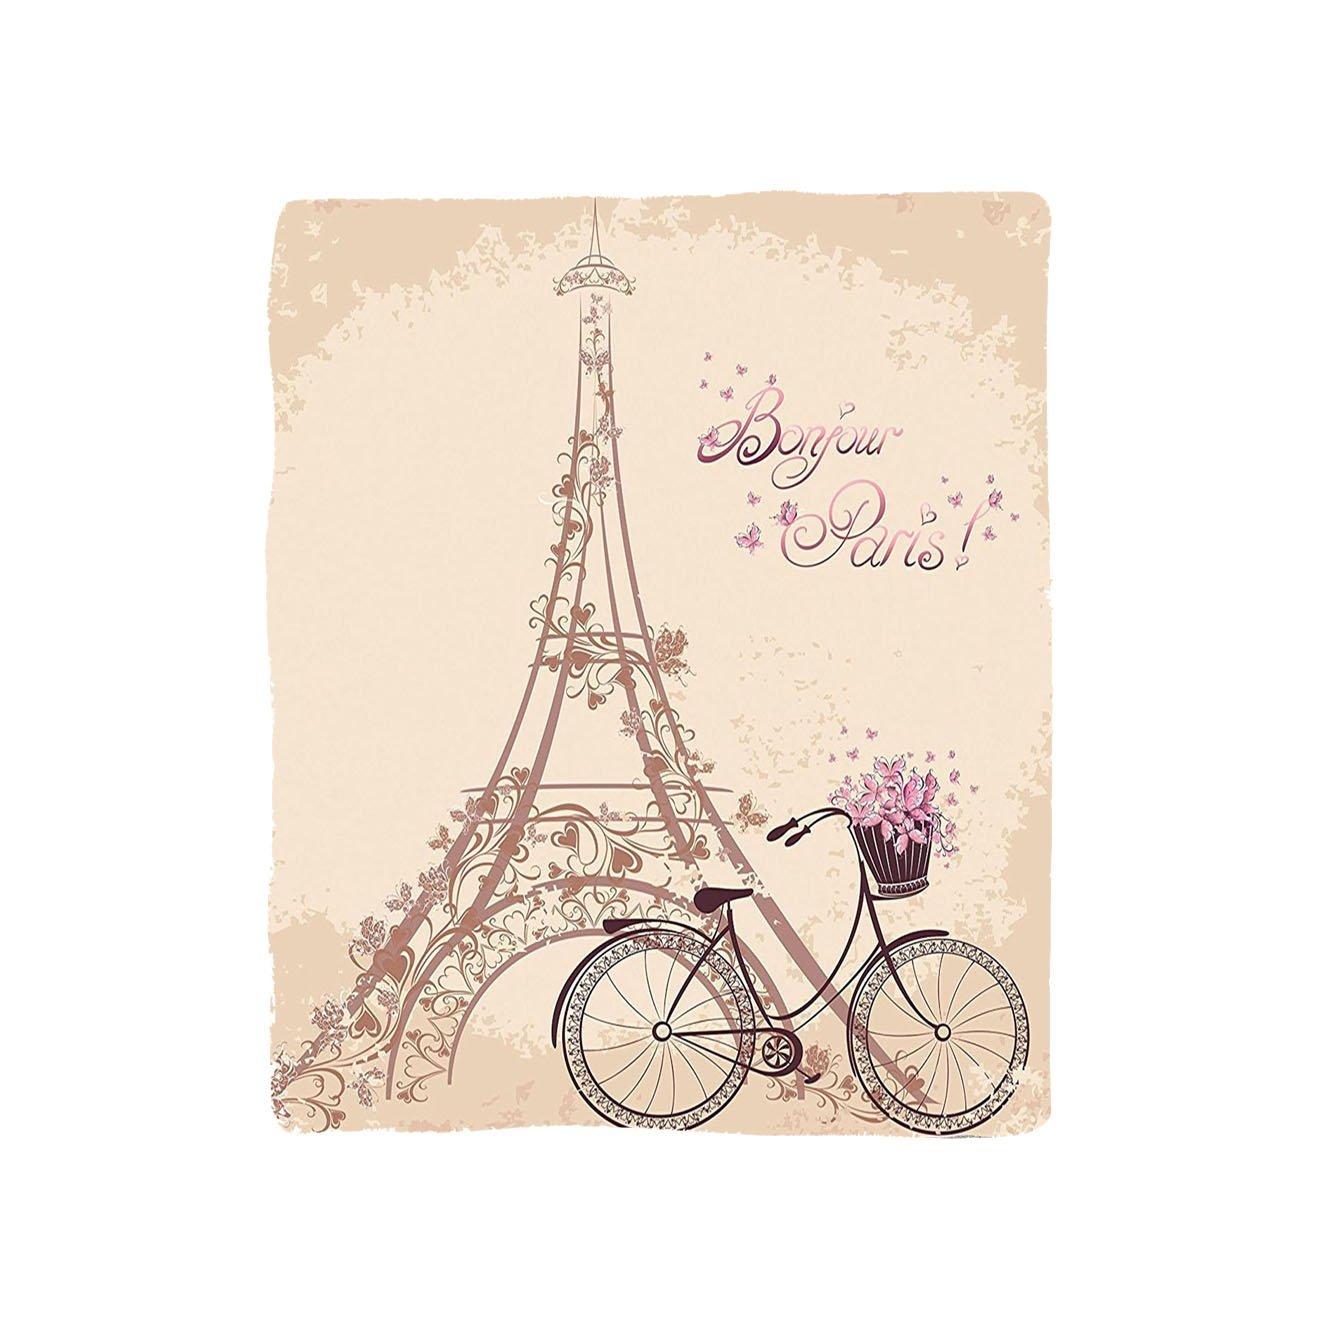 VROSELV Custom Blanket Paris Collection Bonjour Paris Eiffel Tower and Vintage Bicycle with Flowers Retro Soft Color Art Print Bedroom Living Room Dorm Cream Pink